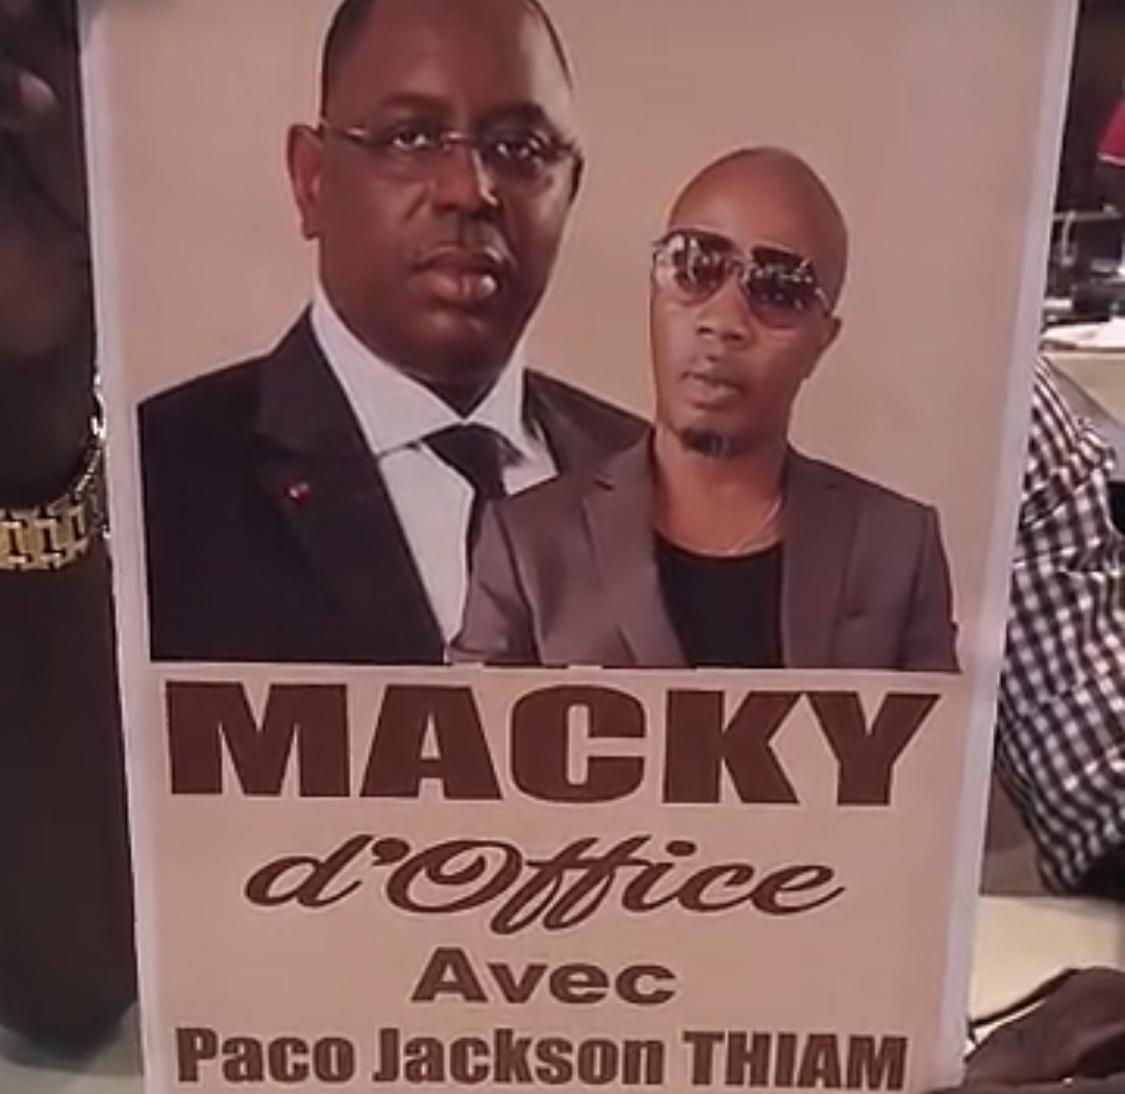 Paco Jackson Thiam lance «Macky d'Office»